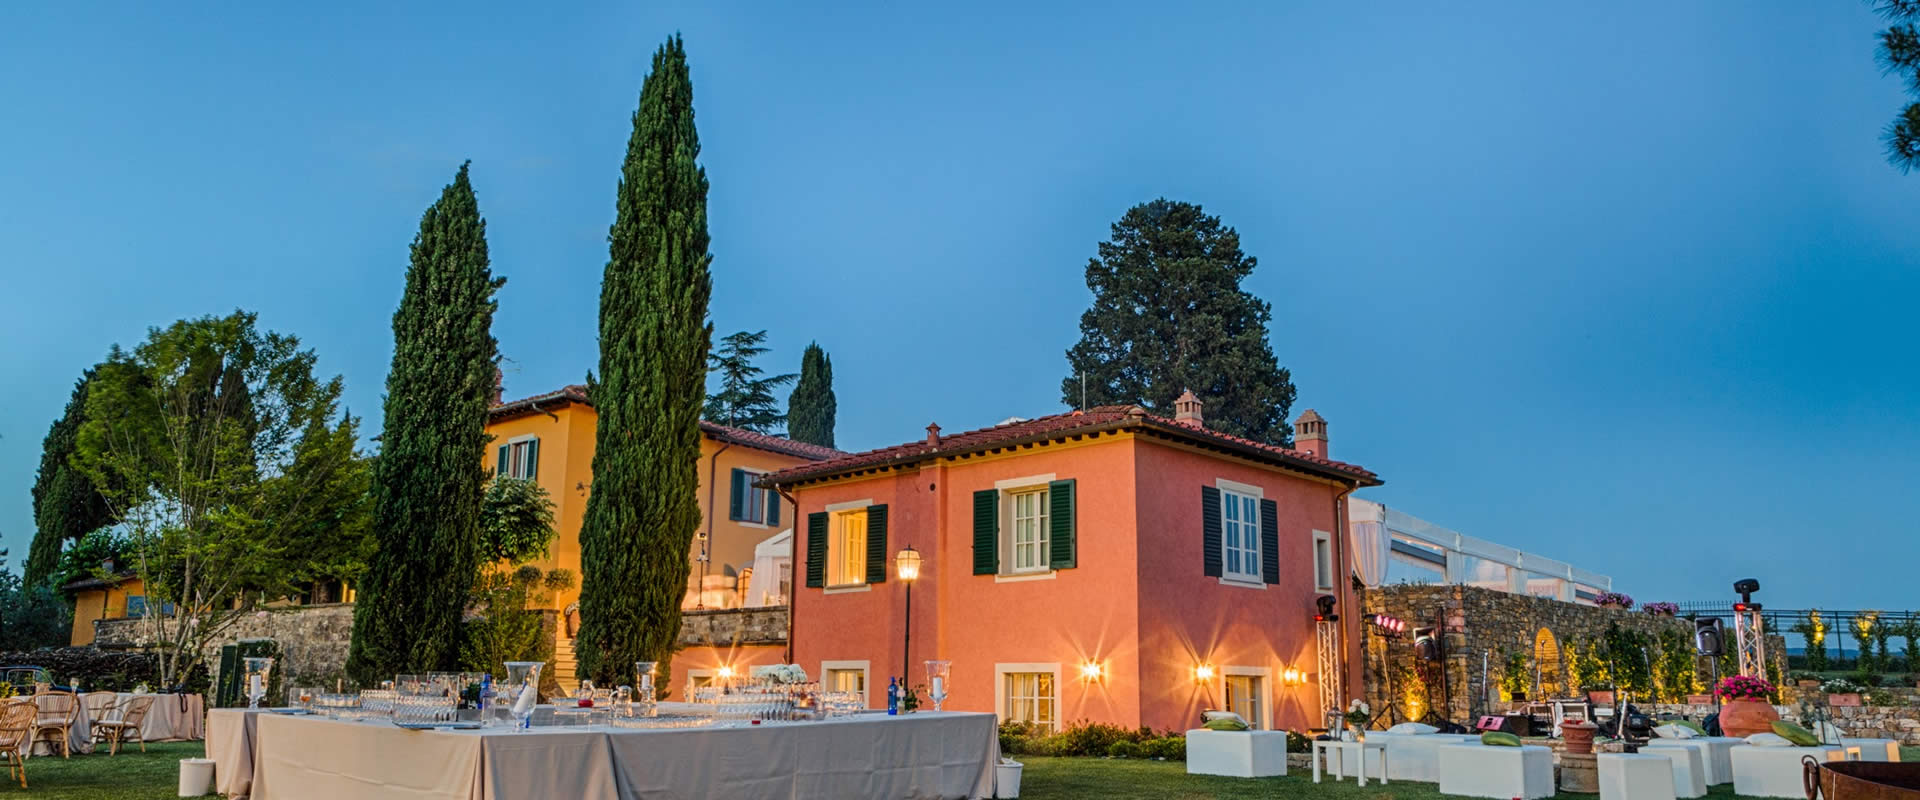 Vacation home rentals Italy